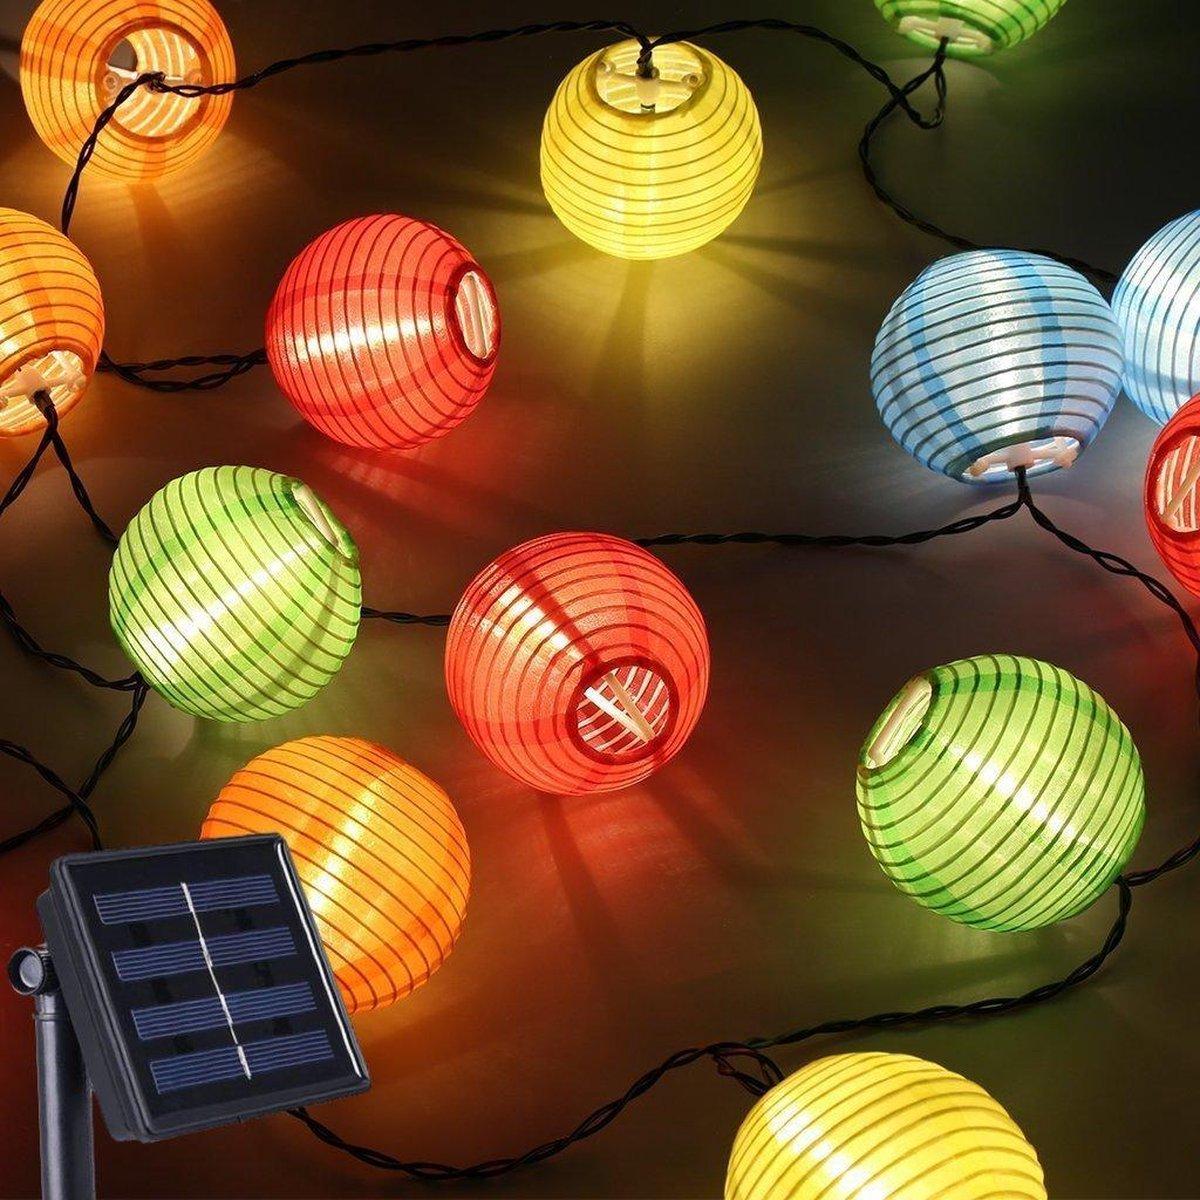 J-Pro Sfeer- en Tuinverlichting op Zonne-Energie - 30 Solar LED 6.5m Lantern Lichtsnoer - Lichtsling